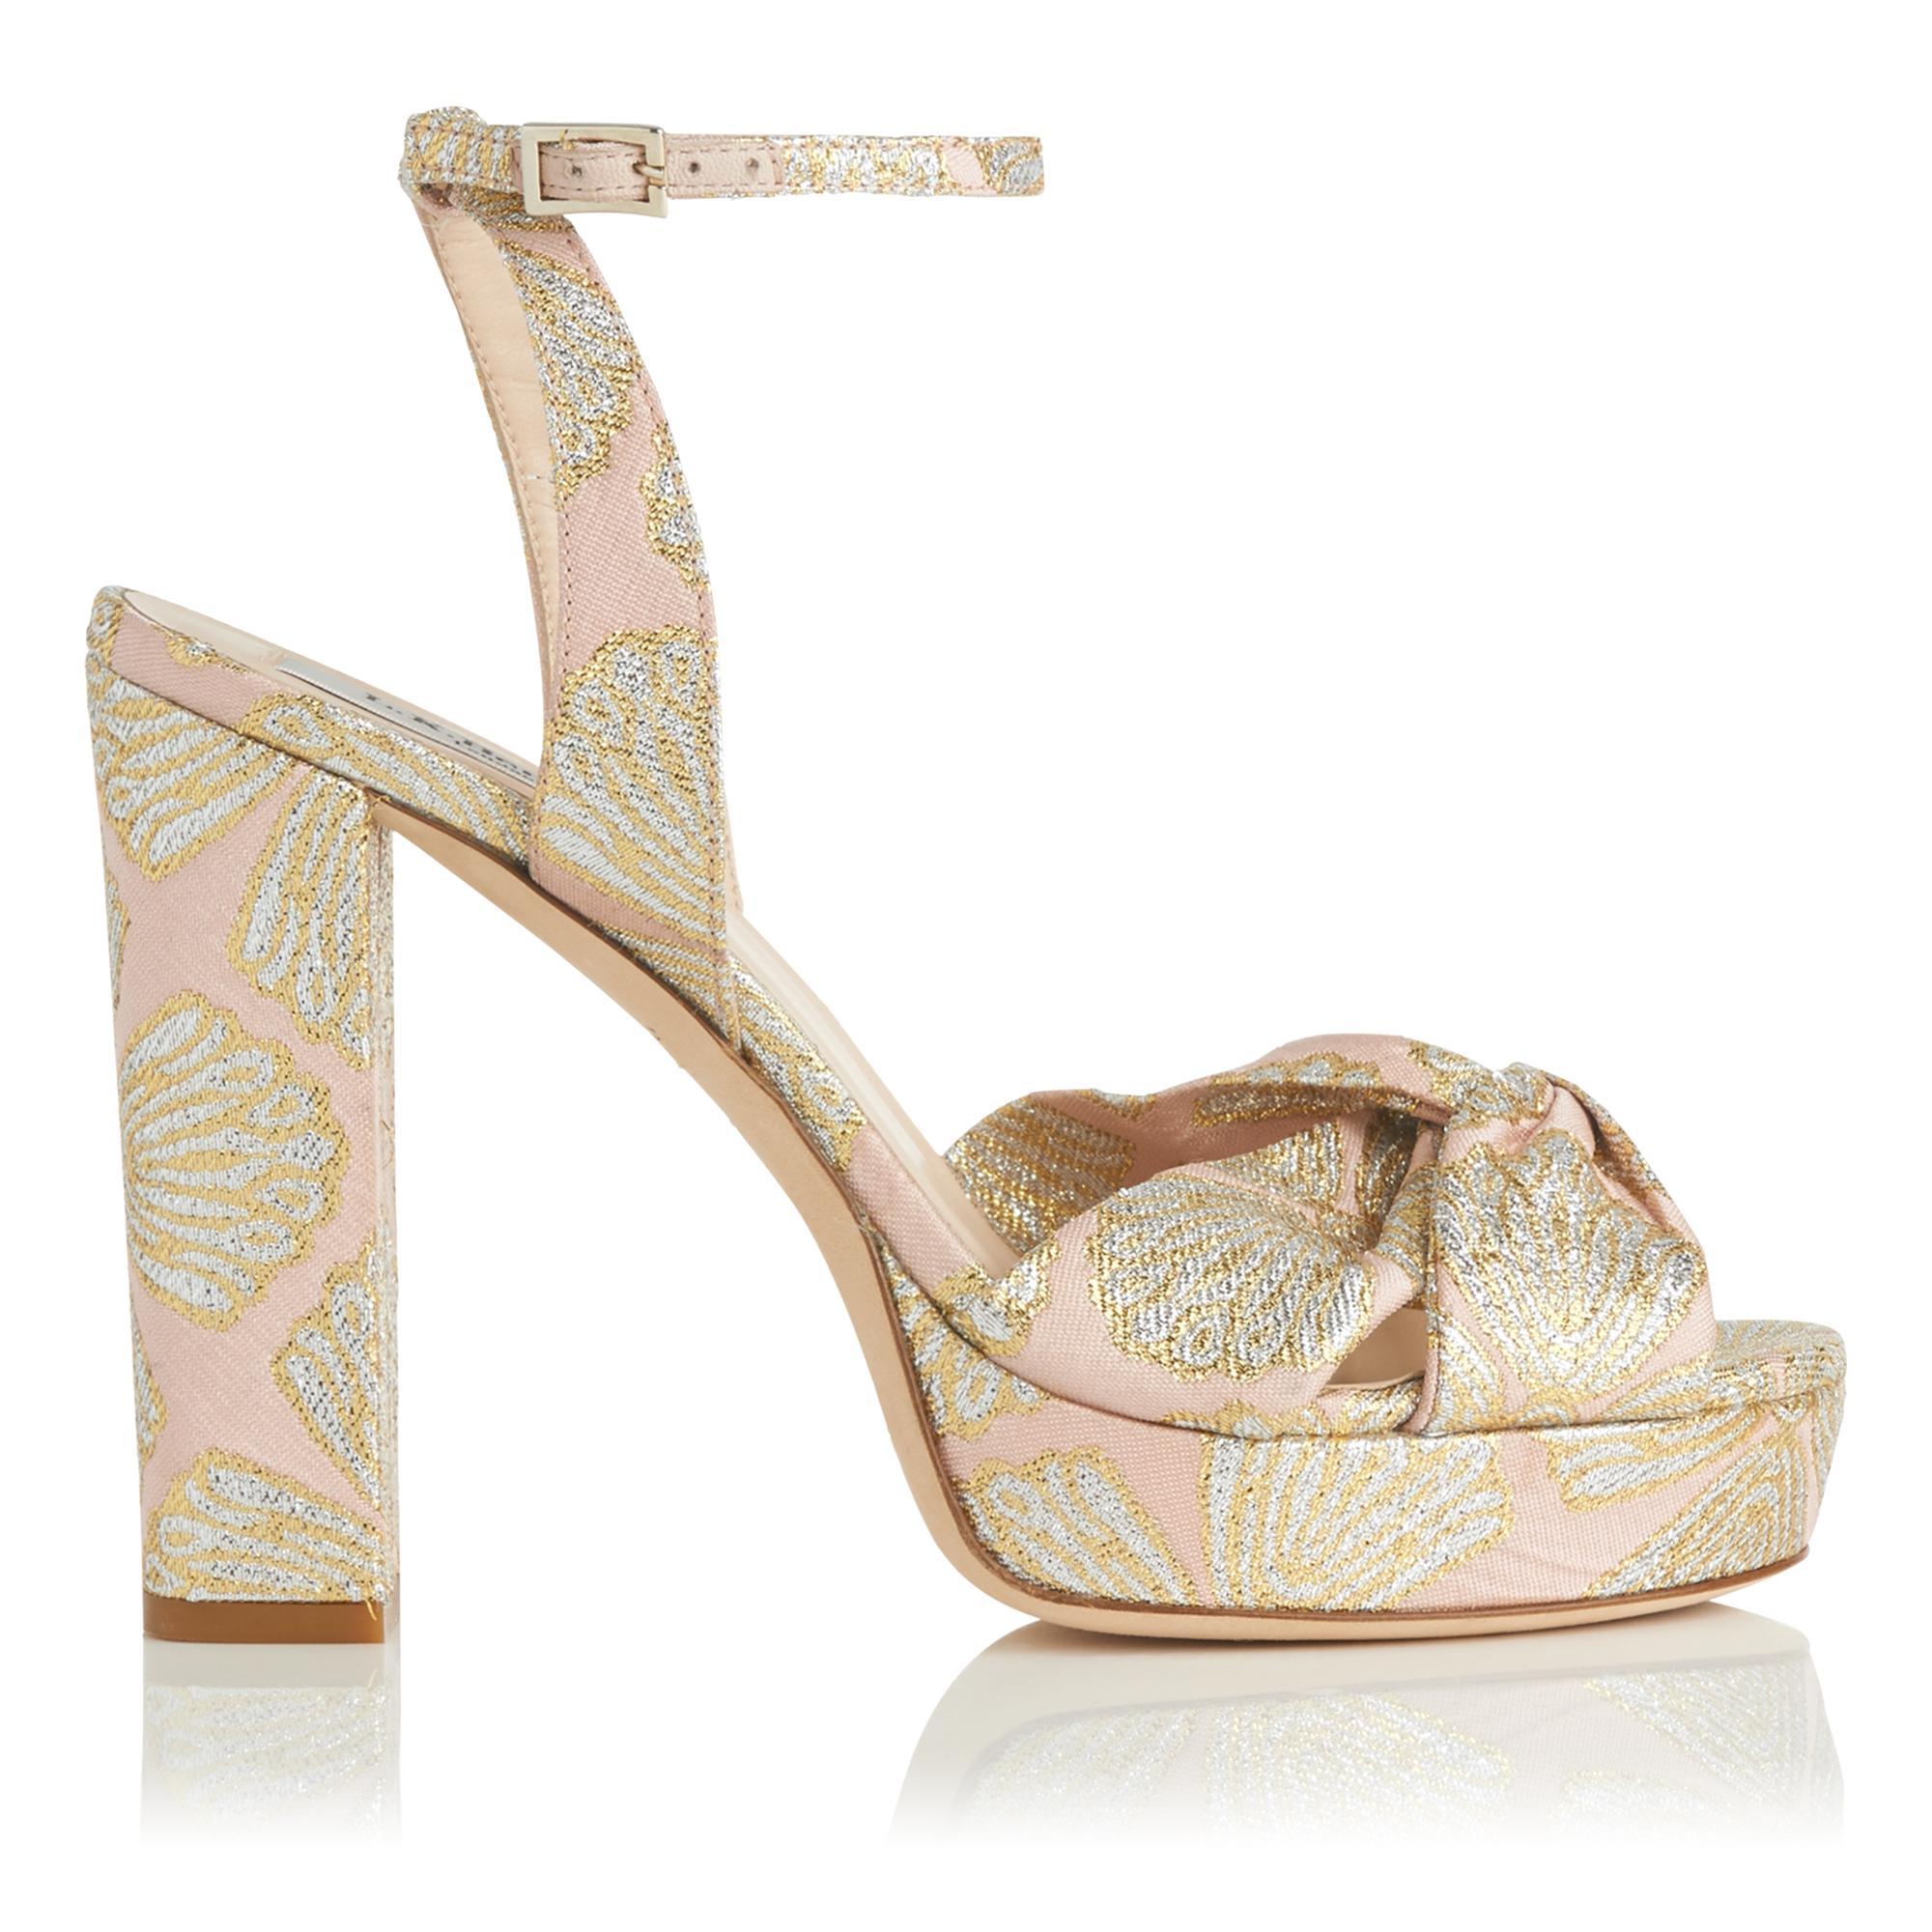 Annabella Pink Metallic Sandal